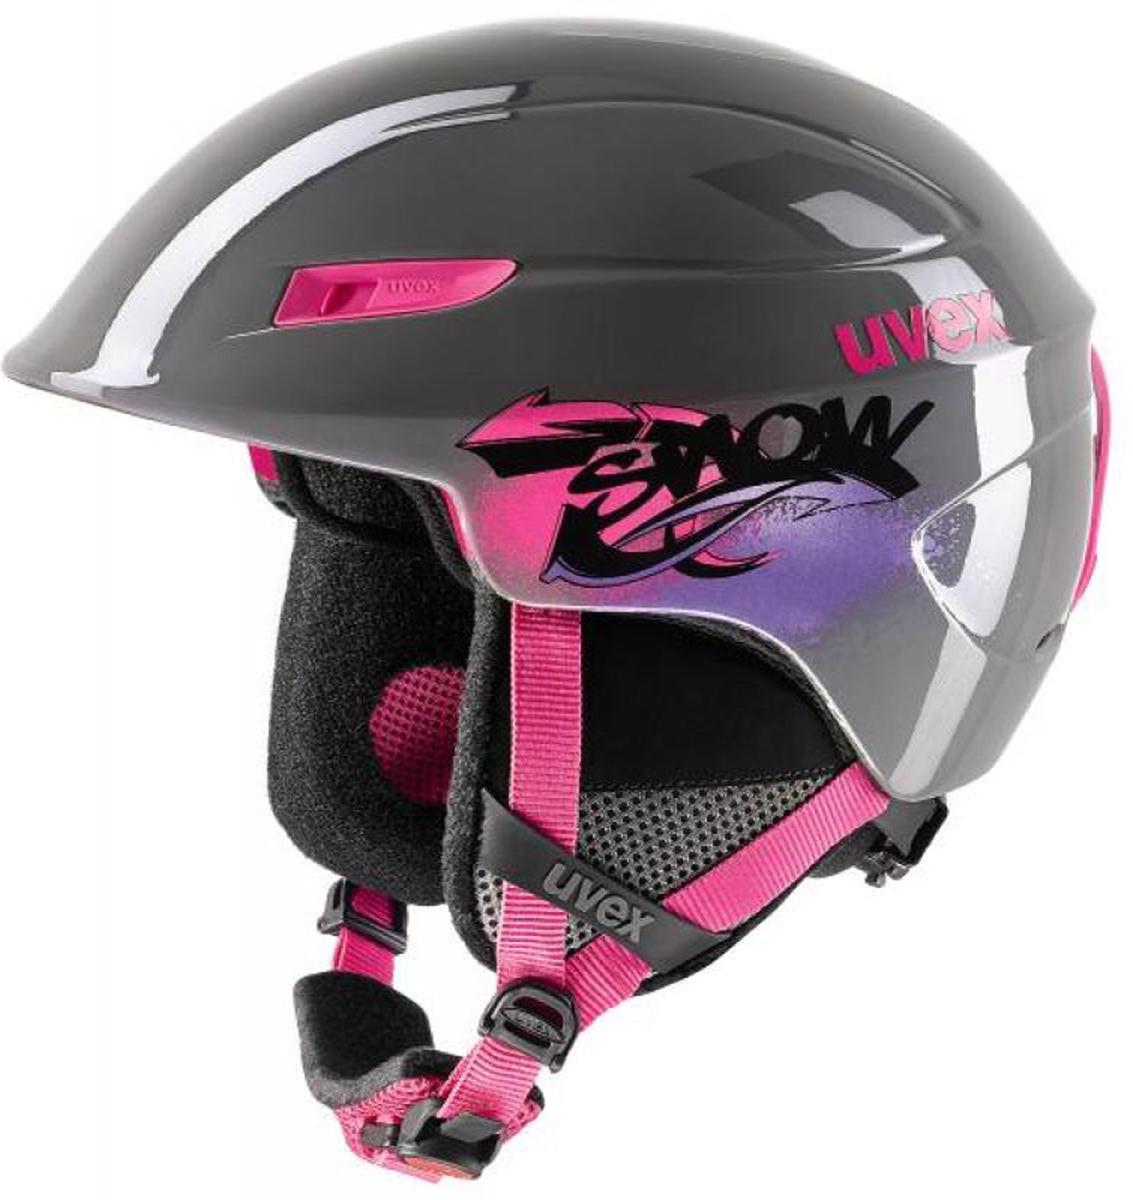 Шлем горнолыжный Uvex U-kid Kid's, цвет: серый. Размер 46-51 uvex маски горнолыжные